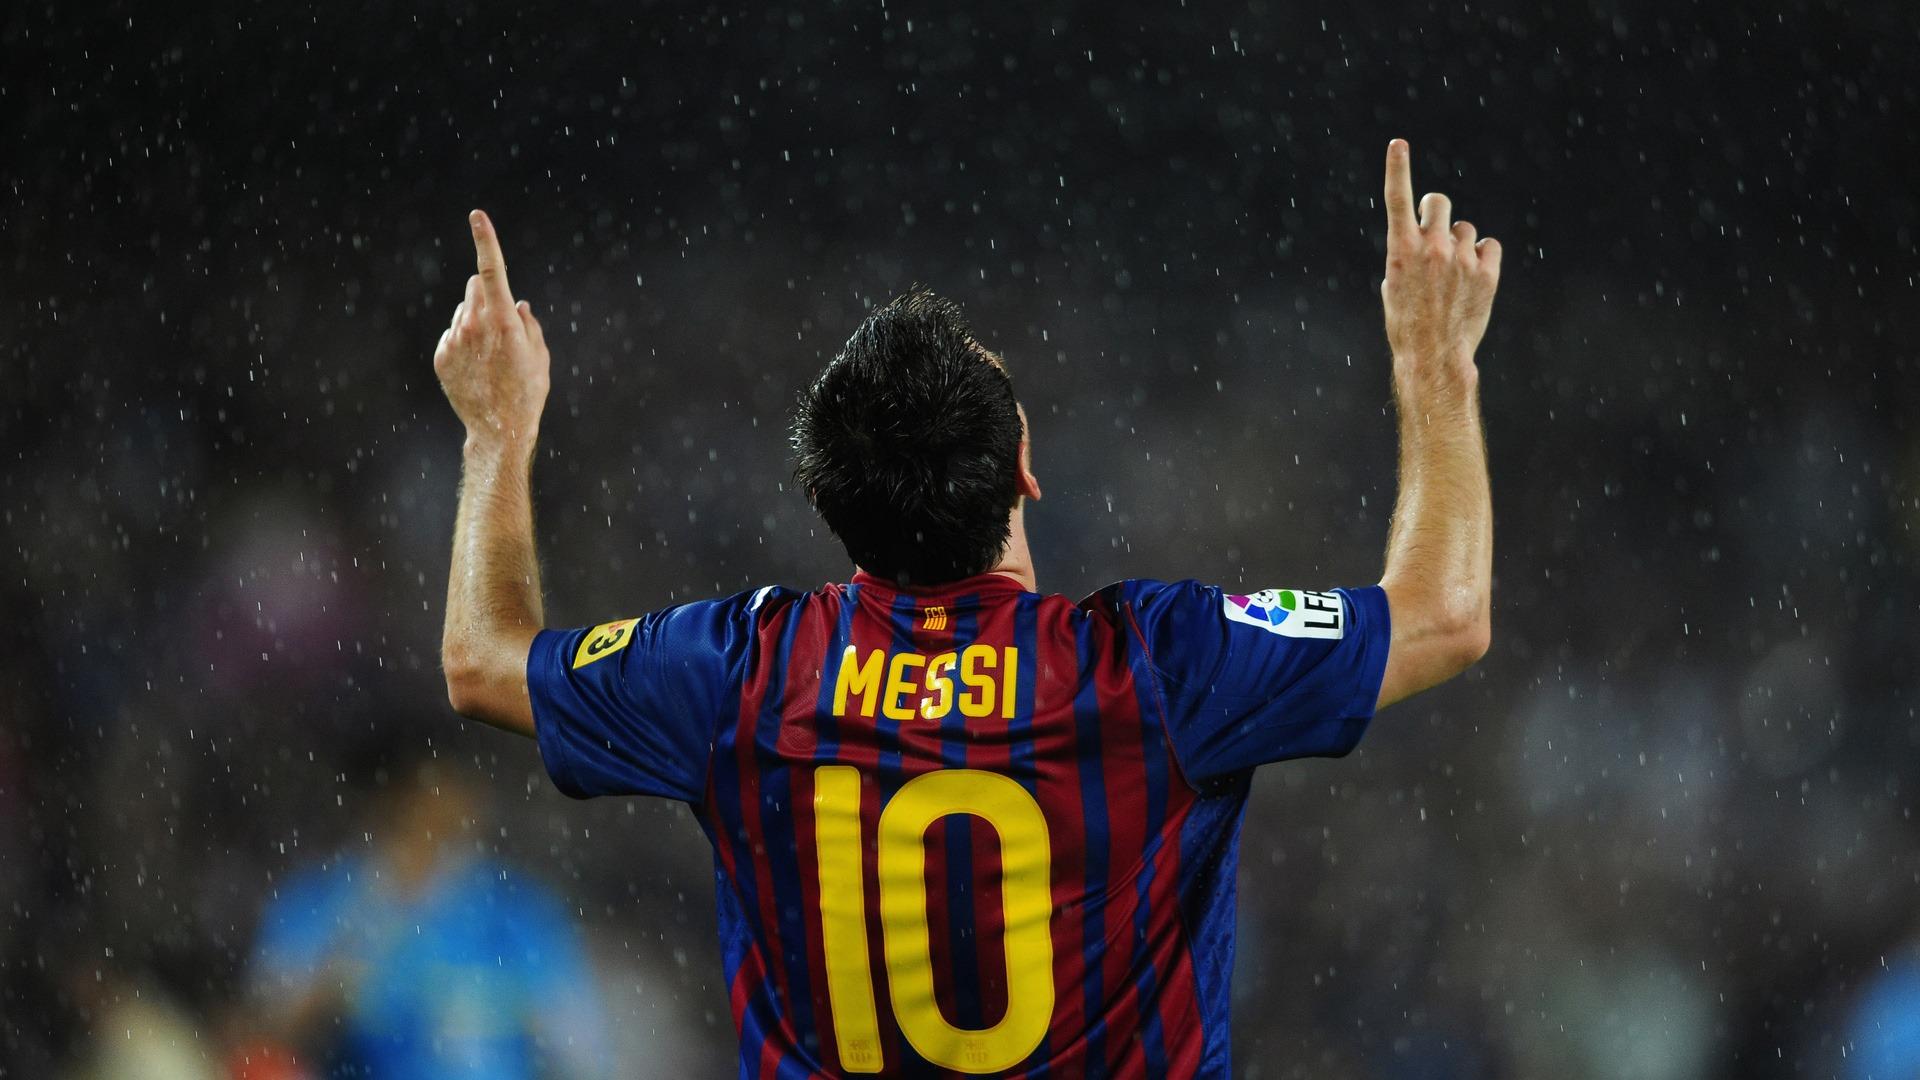 Happy-Lionel-Messi-1080p-HD-Sports-wallpaper-wp3606549